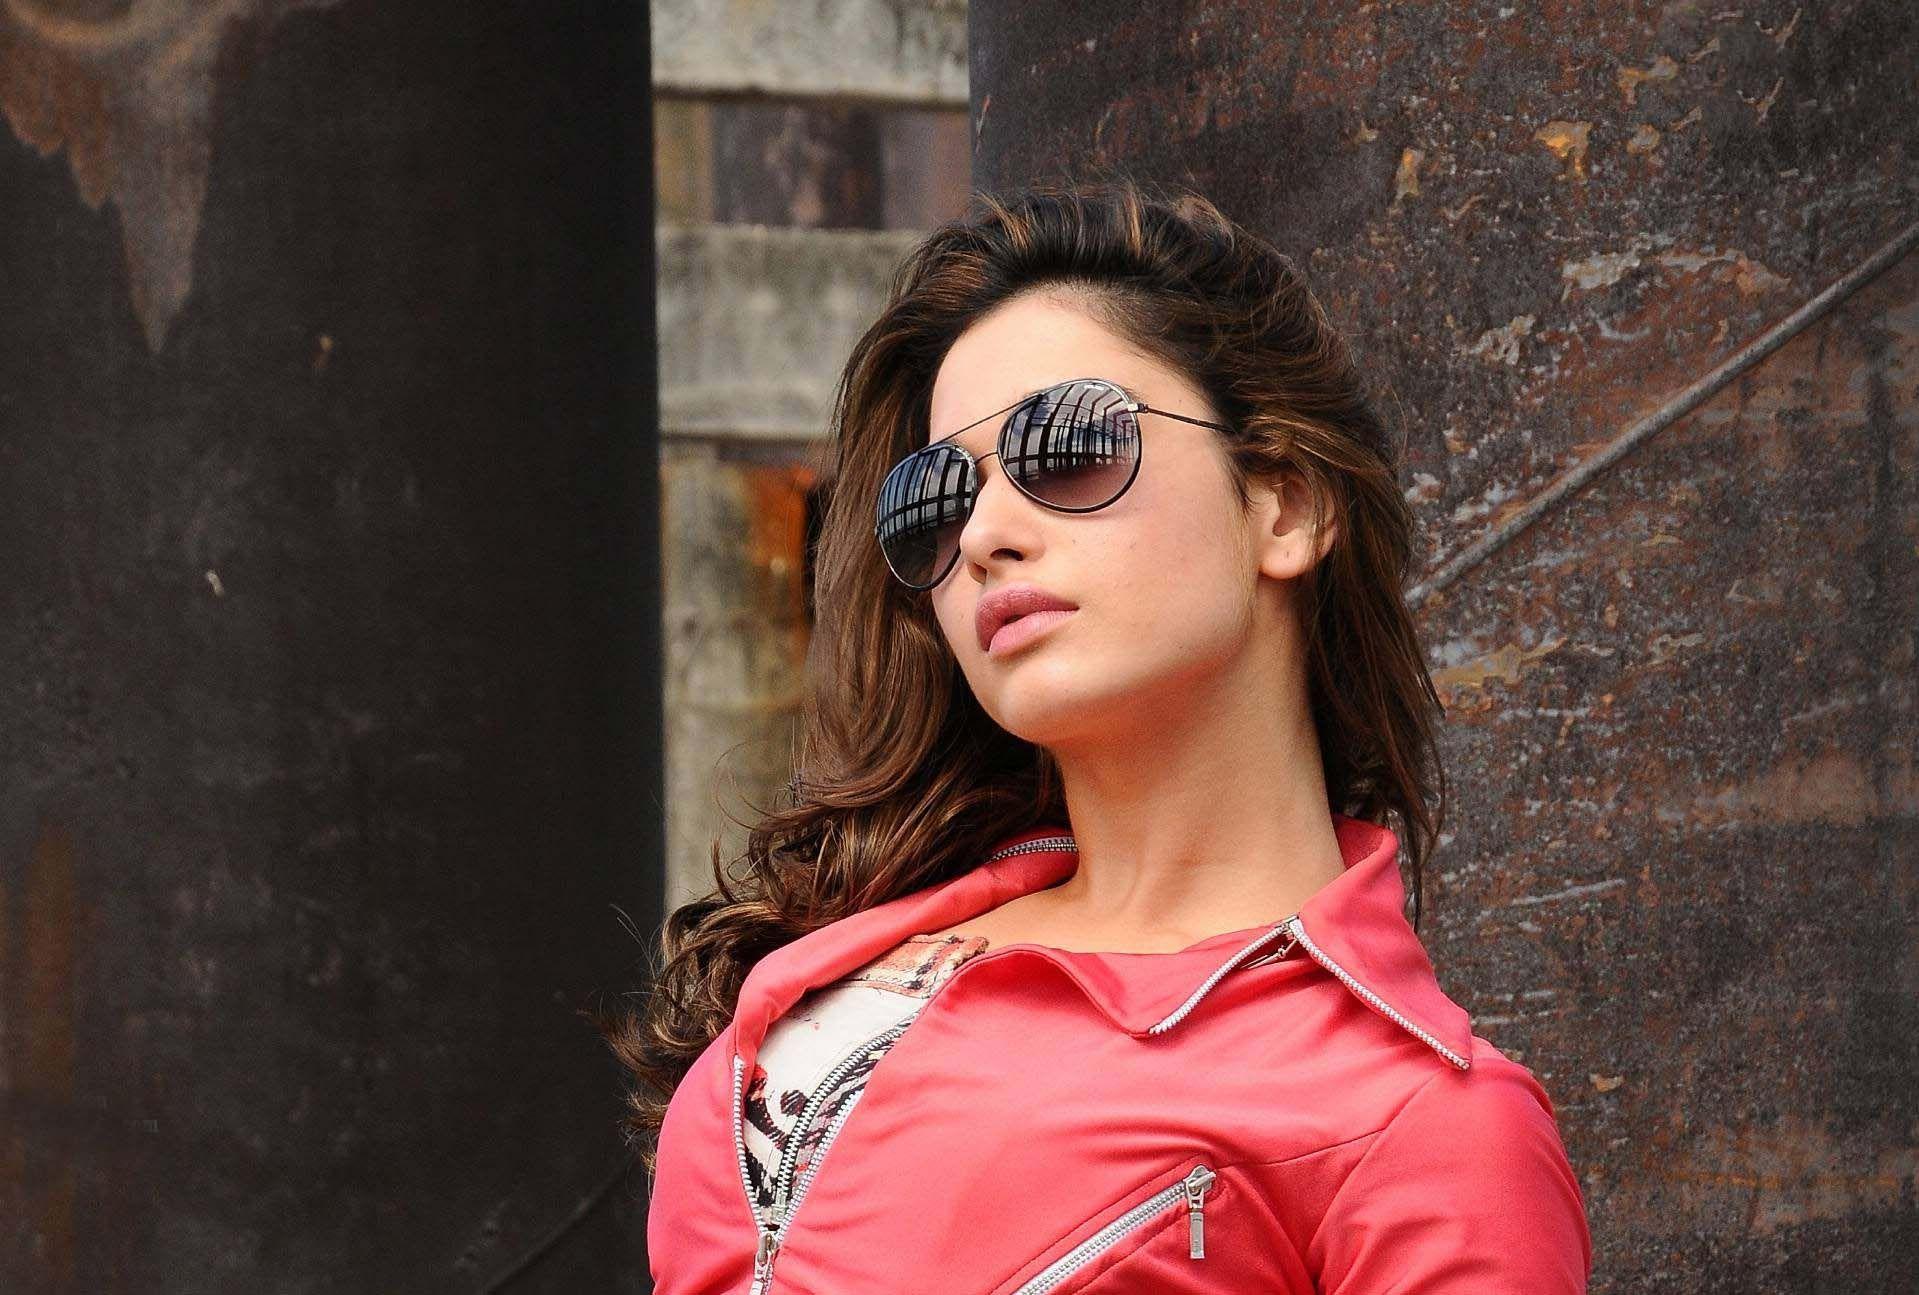 Pretty Girl Quotes Wallpapers Hd Tamanna Bhatia Iphone 5 Backgrounds Pixelstalk Net